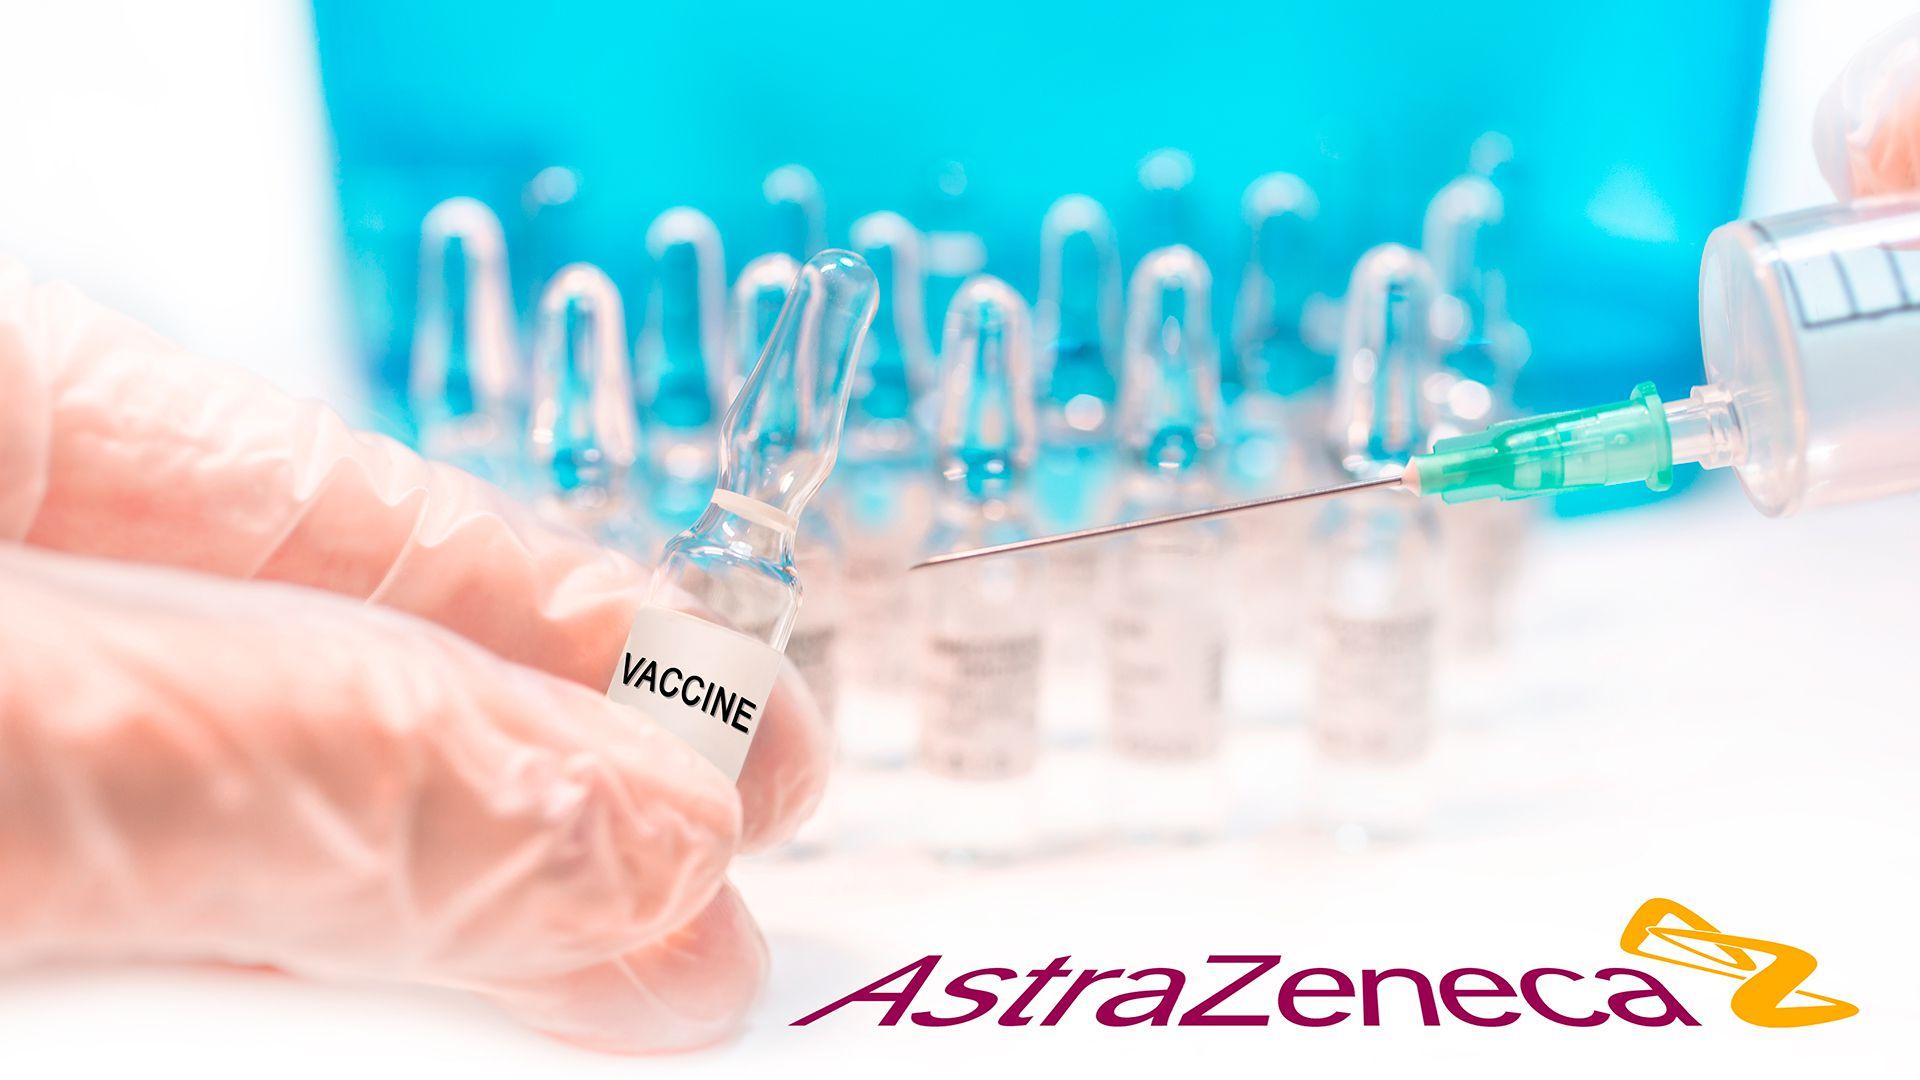 Foto destacada vacuna AstraZeneca-Oxford